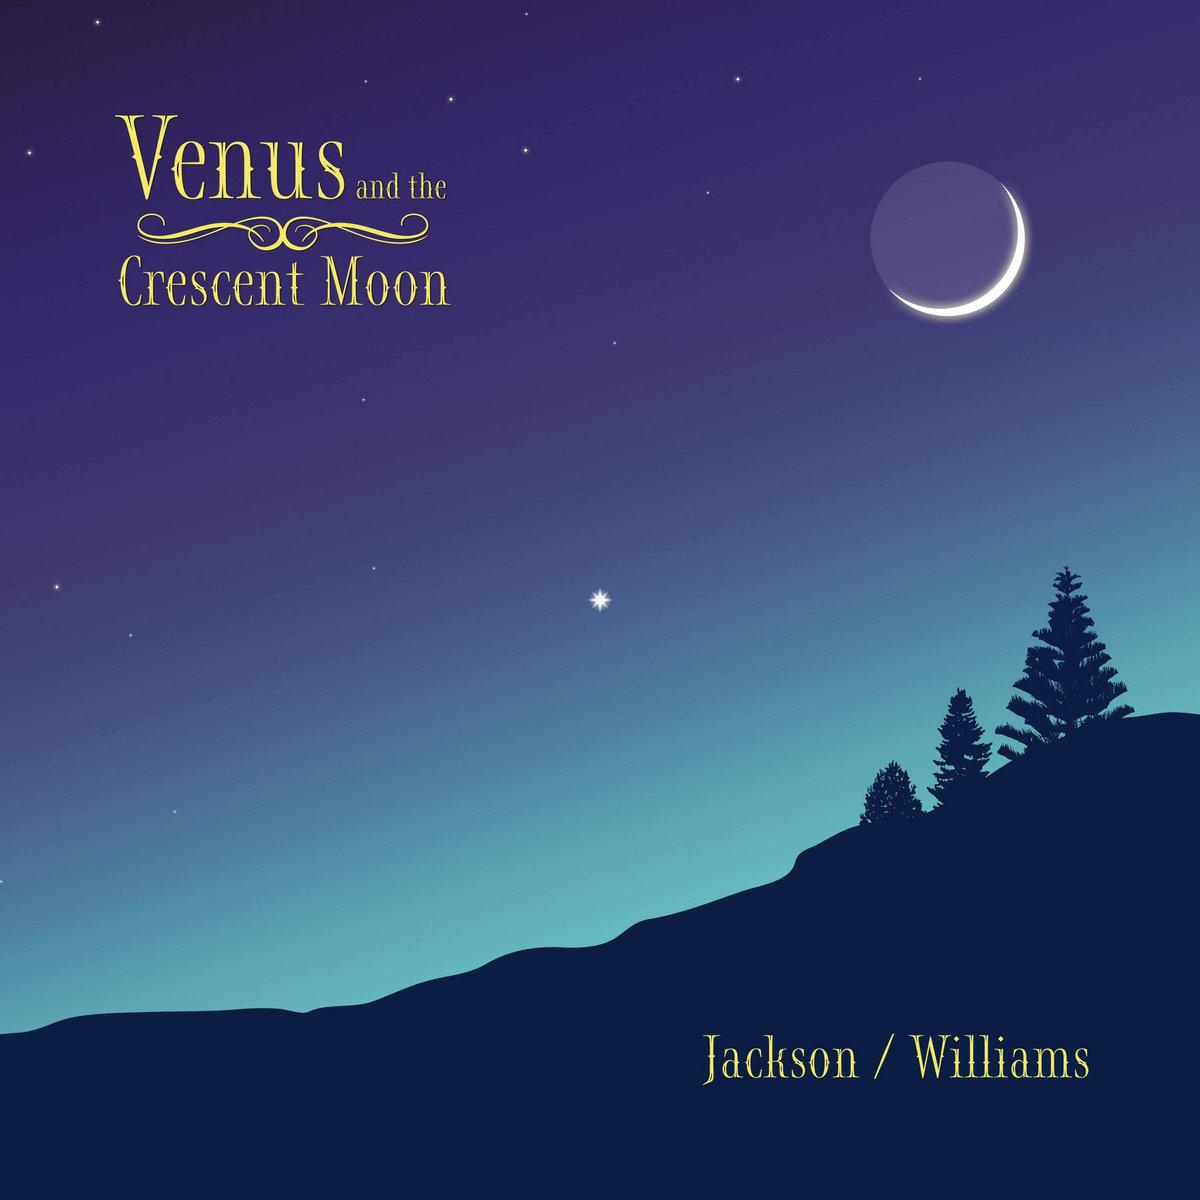 Jackson/Williams